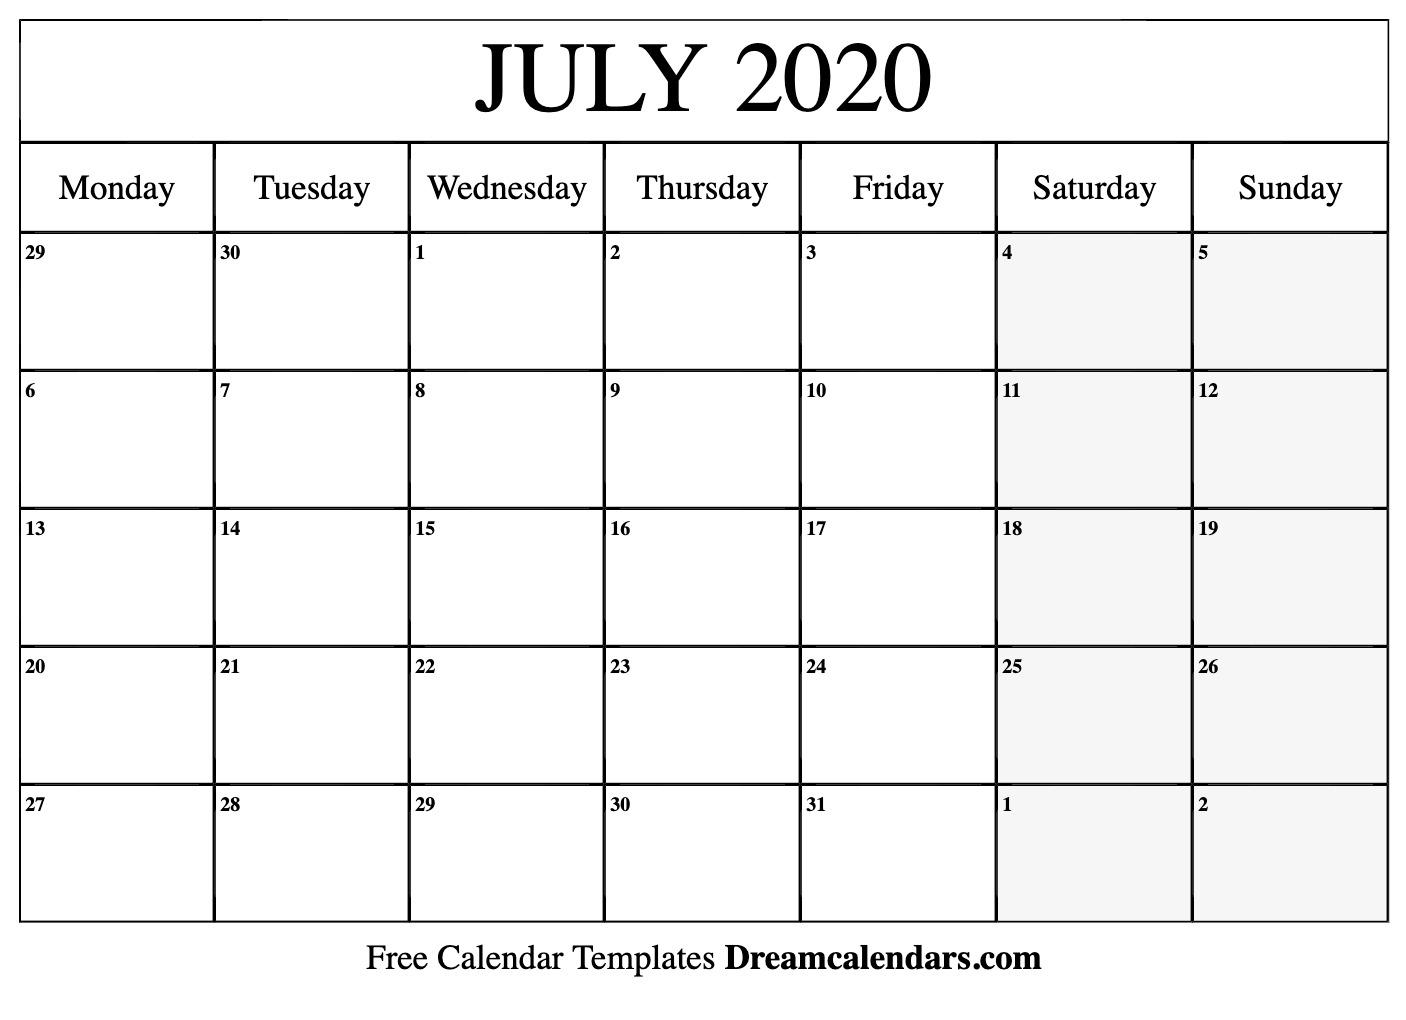 July Calendar Template 2020 - Wpa.wpart.co